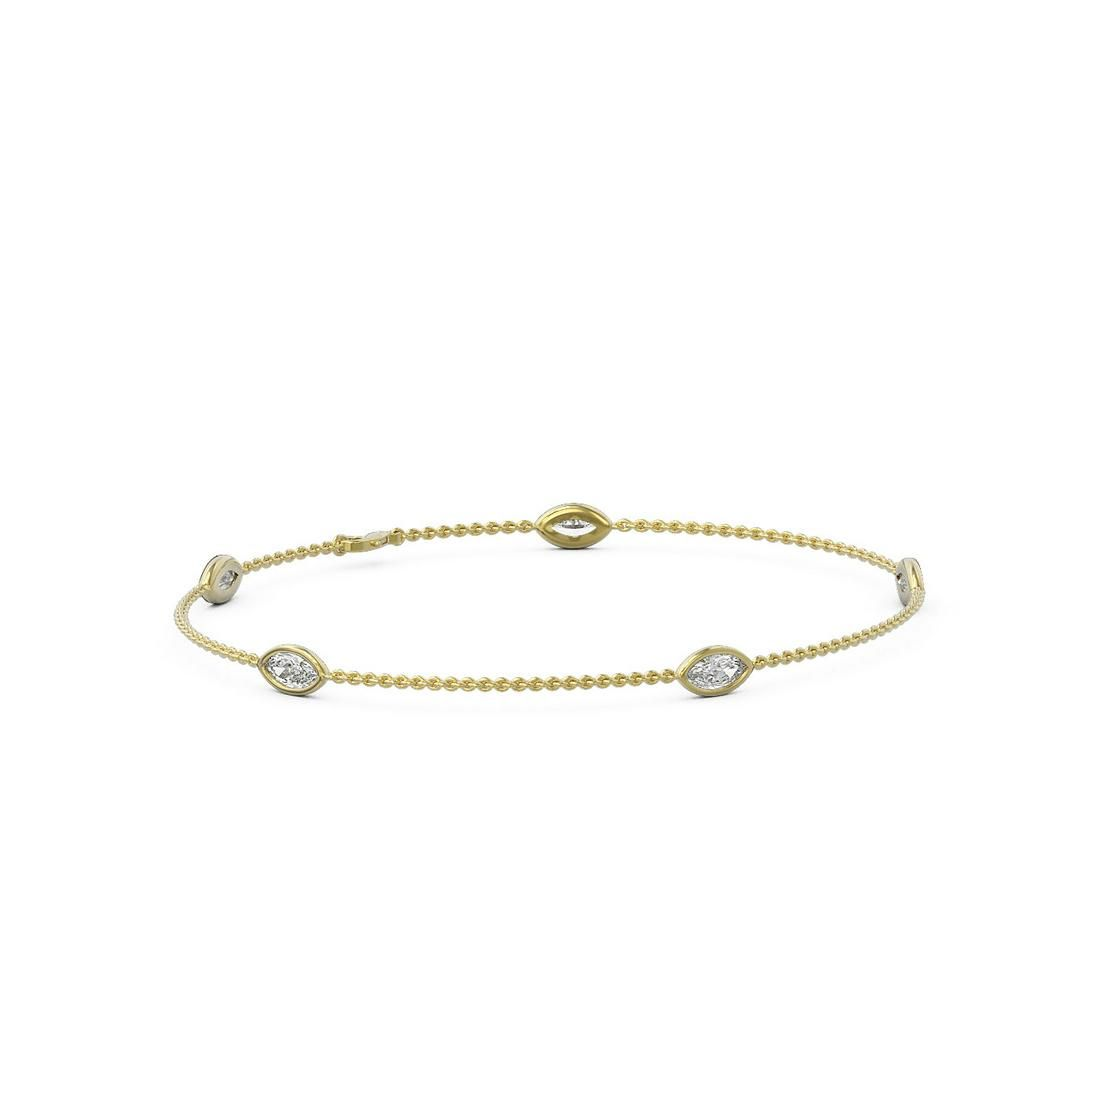 1.25 ctw Marquise Diamond Station Bracelet 18K Yellow